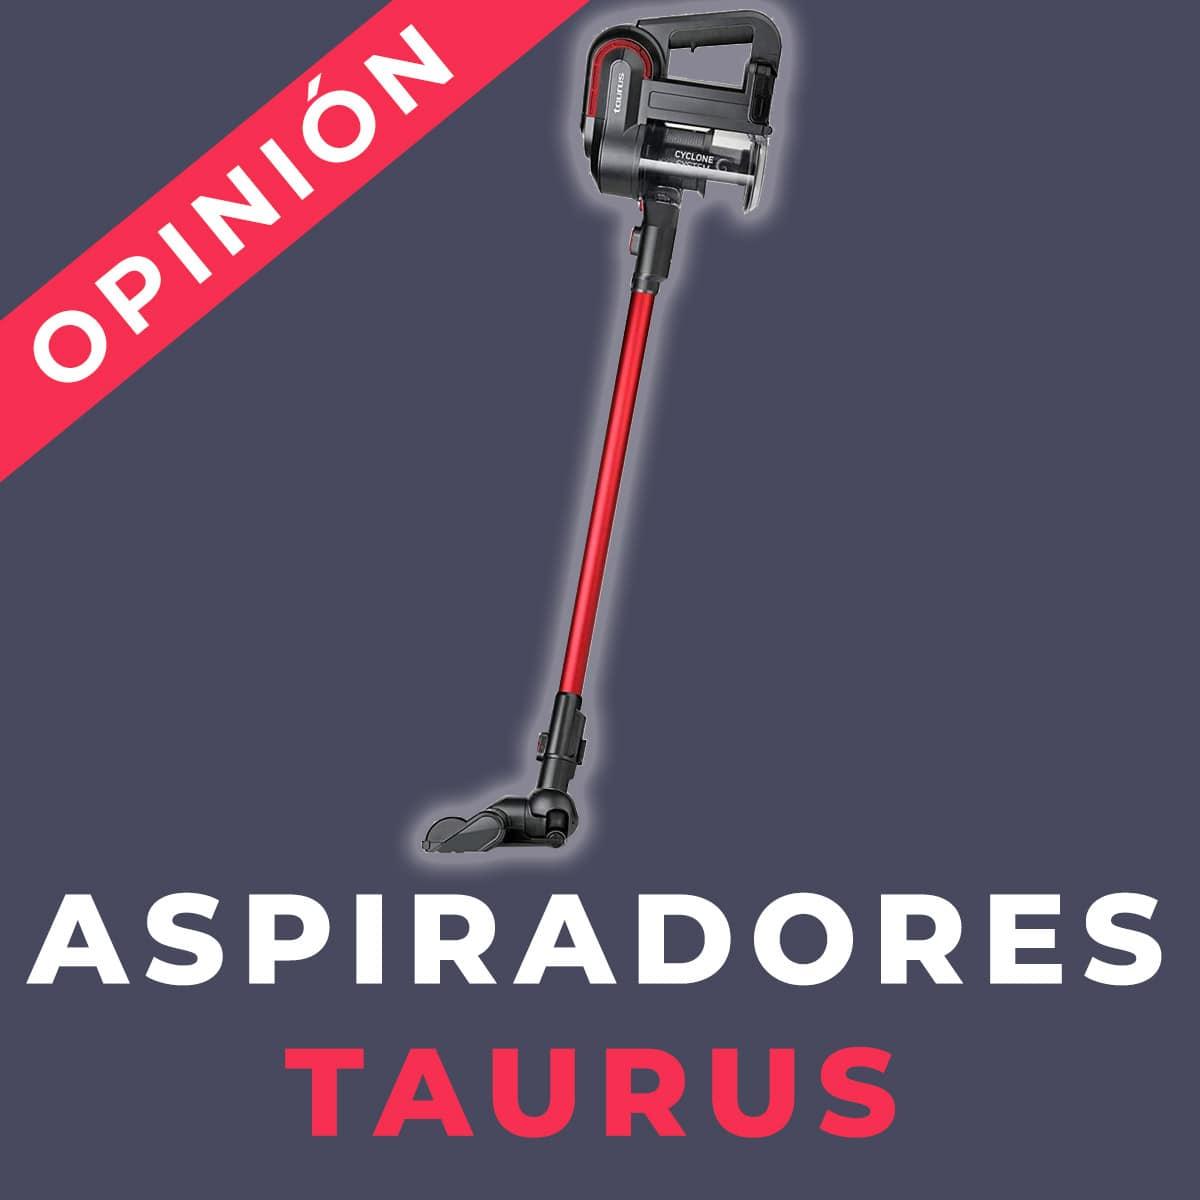 aspirador taurus